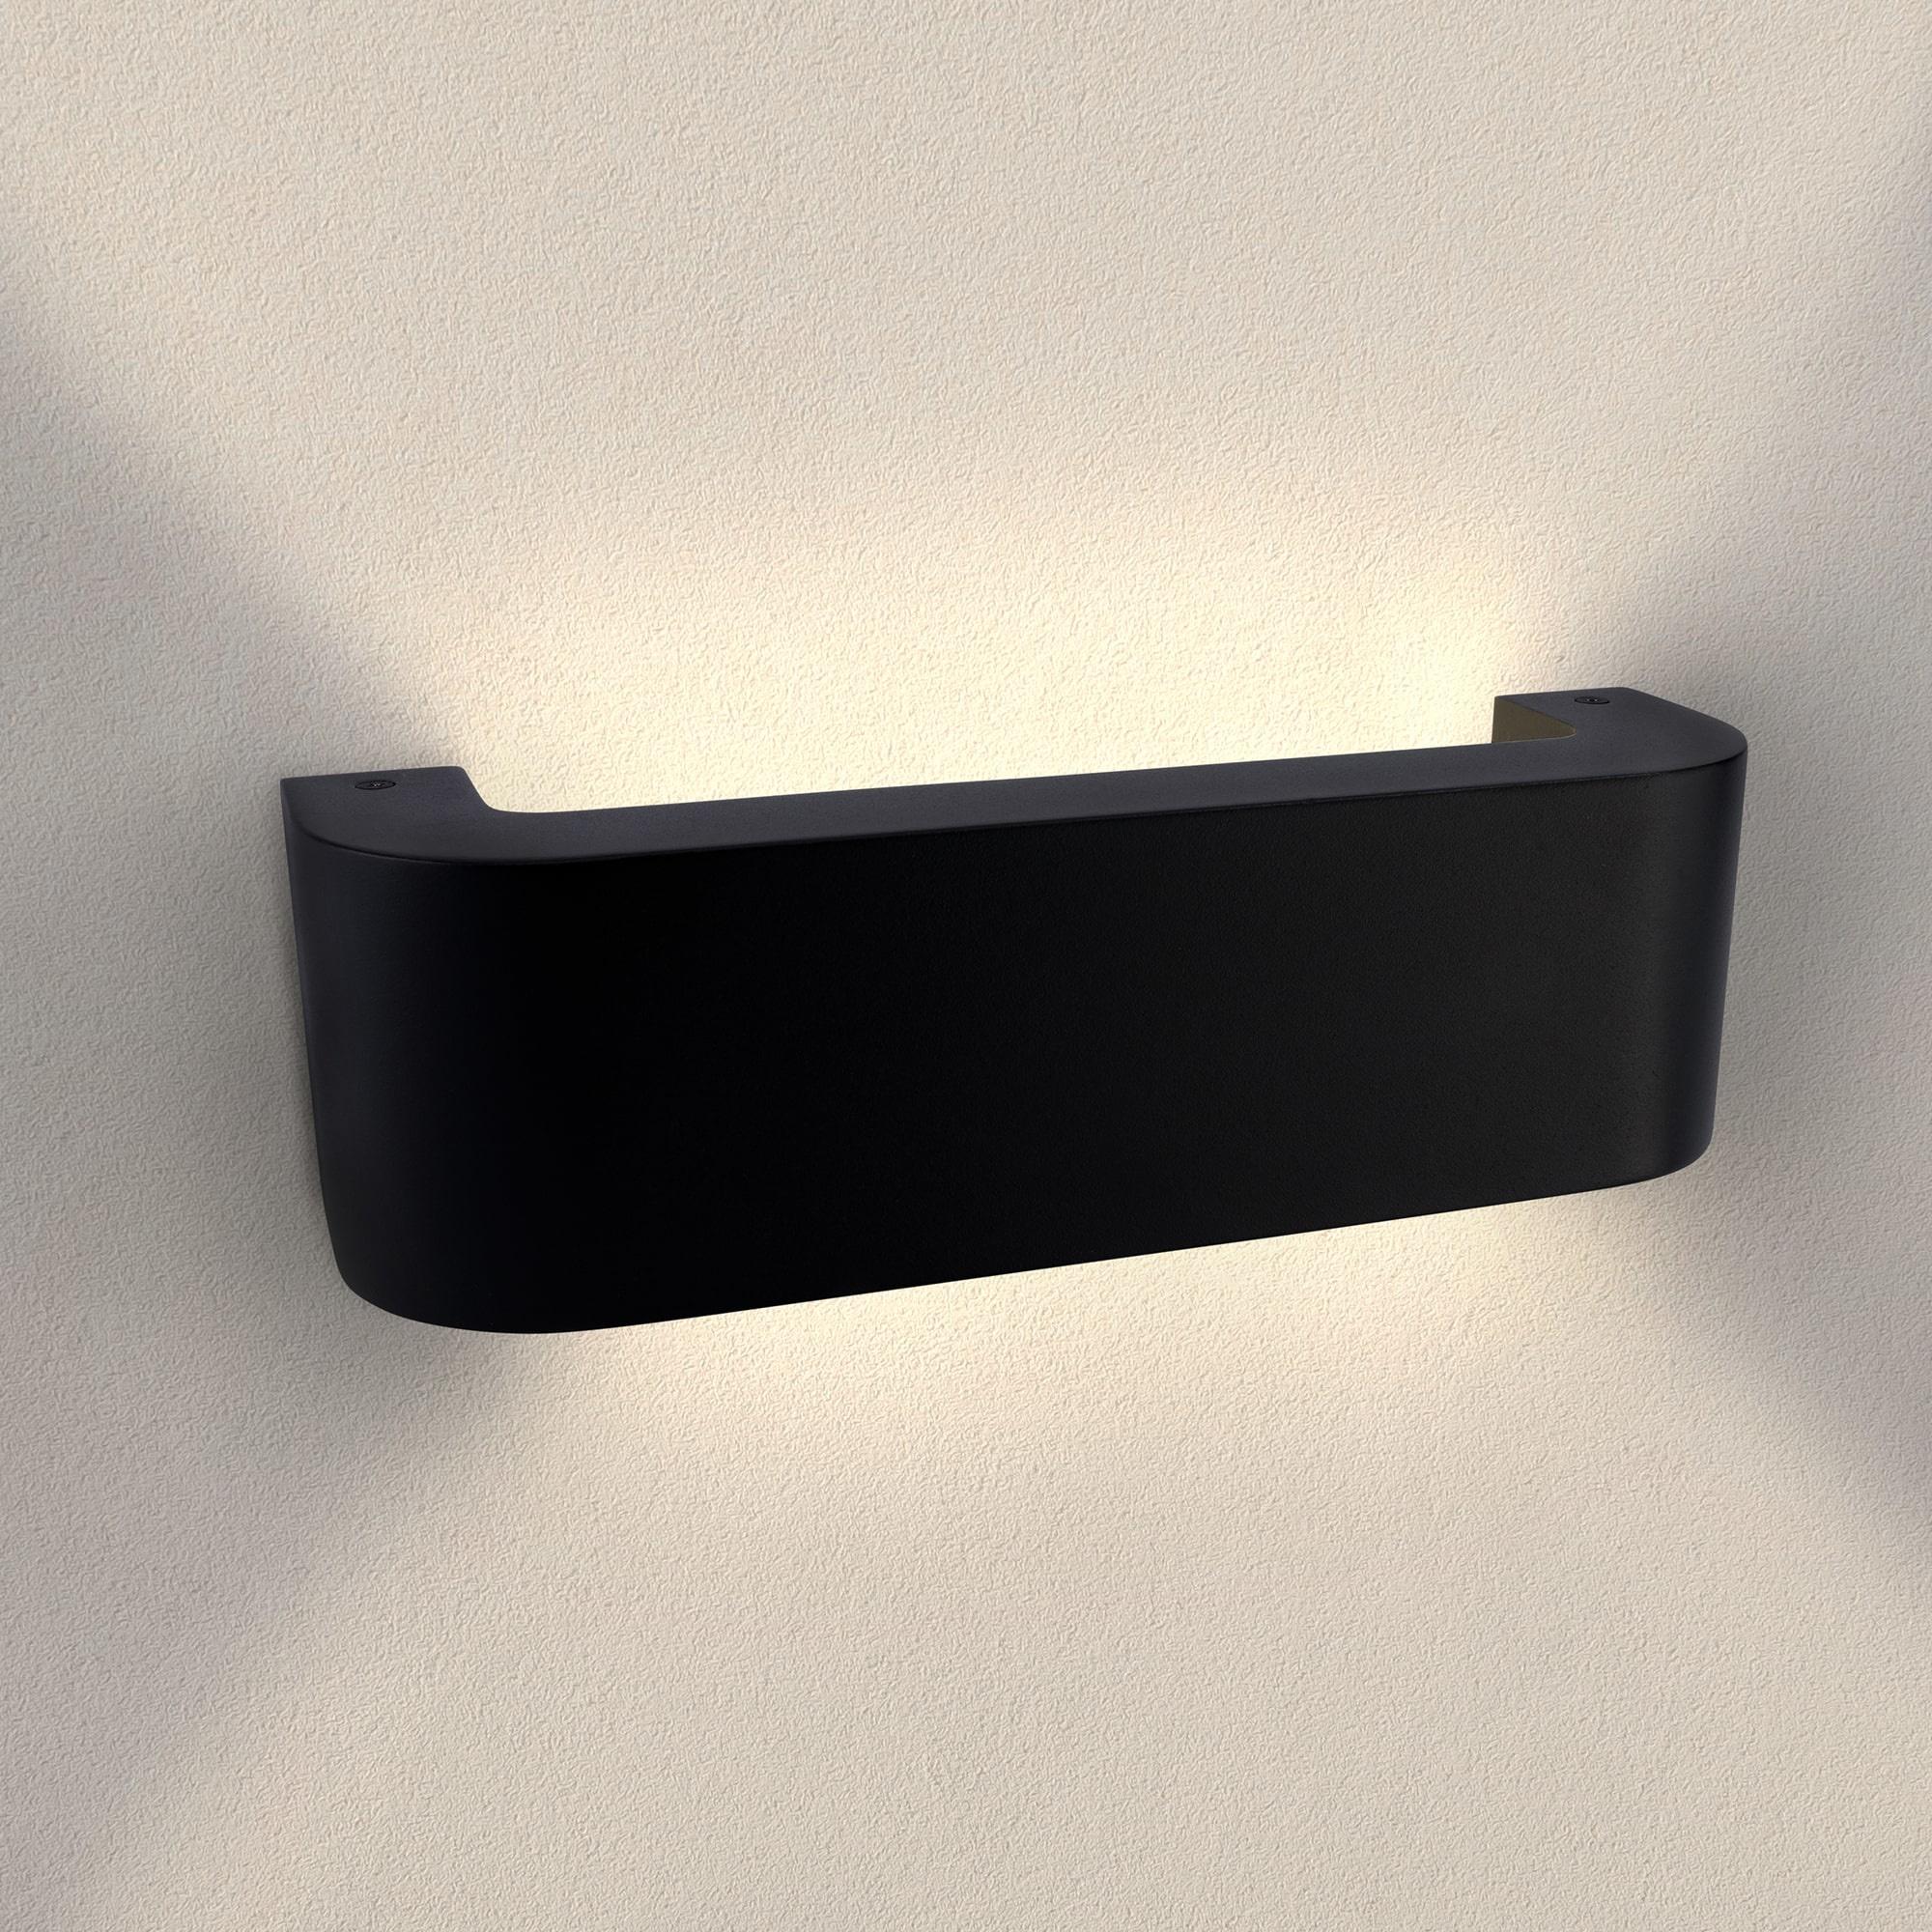 LED Wandlamp Buiten Norma Zwart - 3000K - 9W - IP54